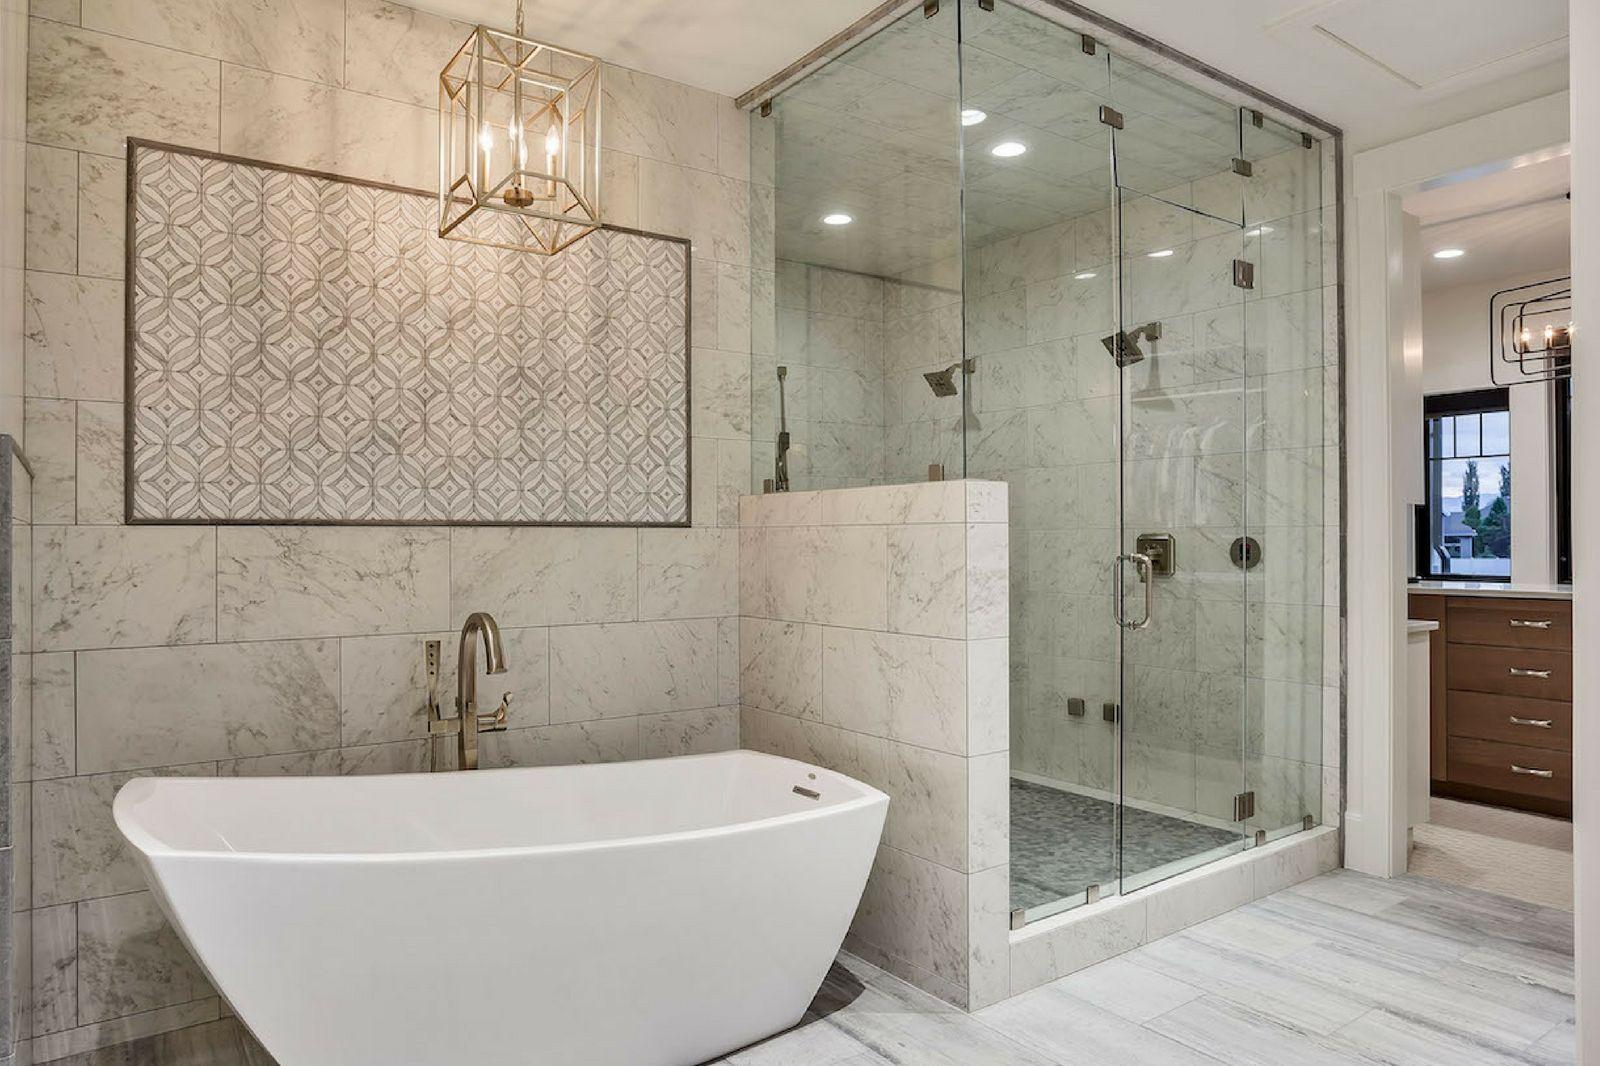 Pin by Monica Barlow on Master room / bath   Utah home ...